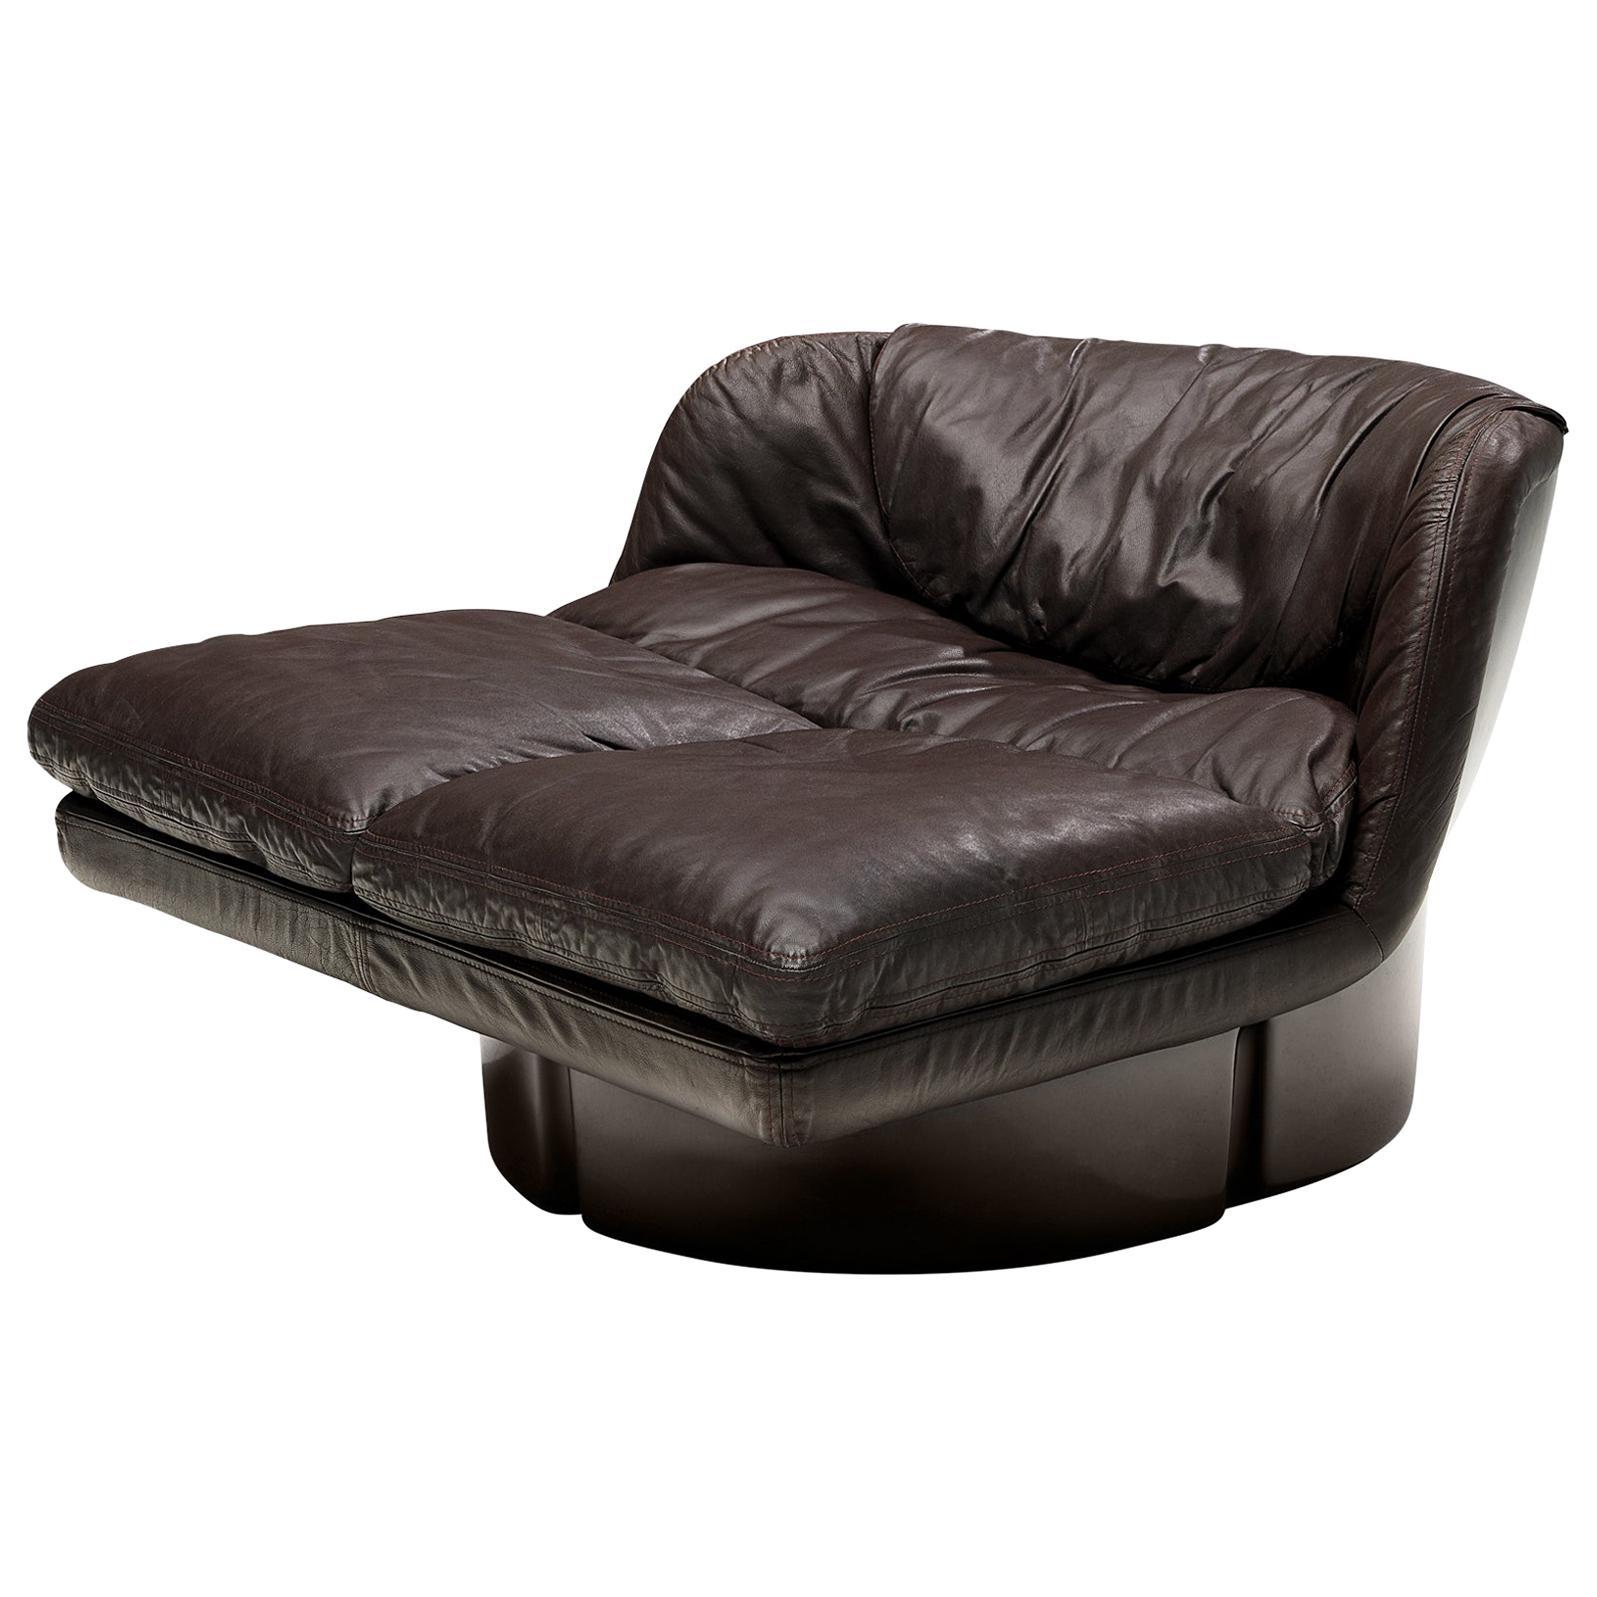 Ammannati & Vitelli Lounge Chair in Leather